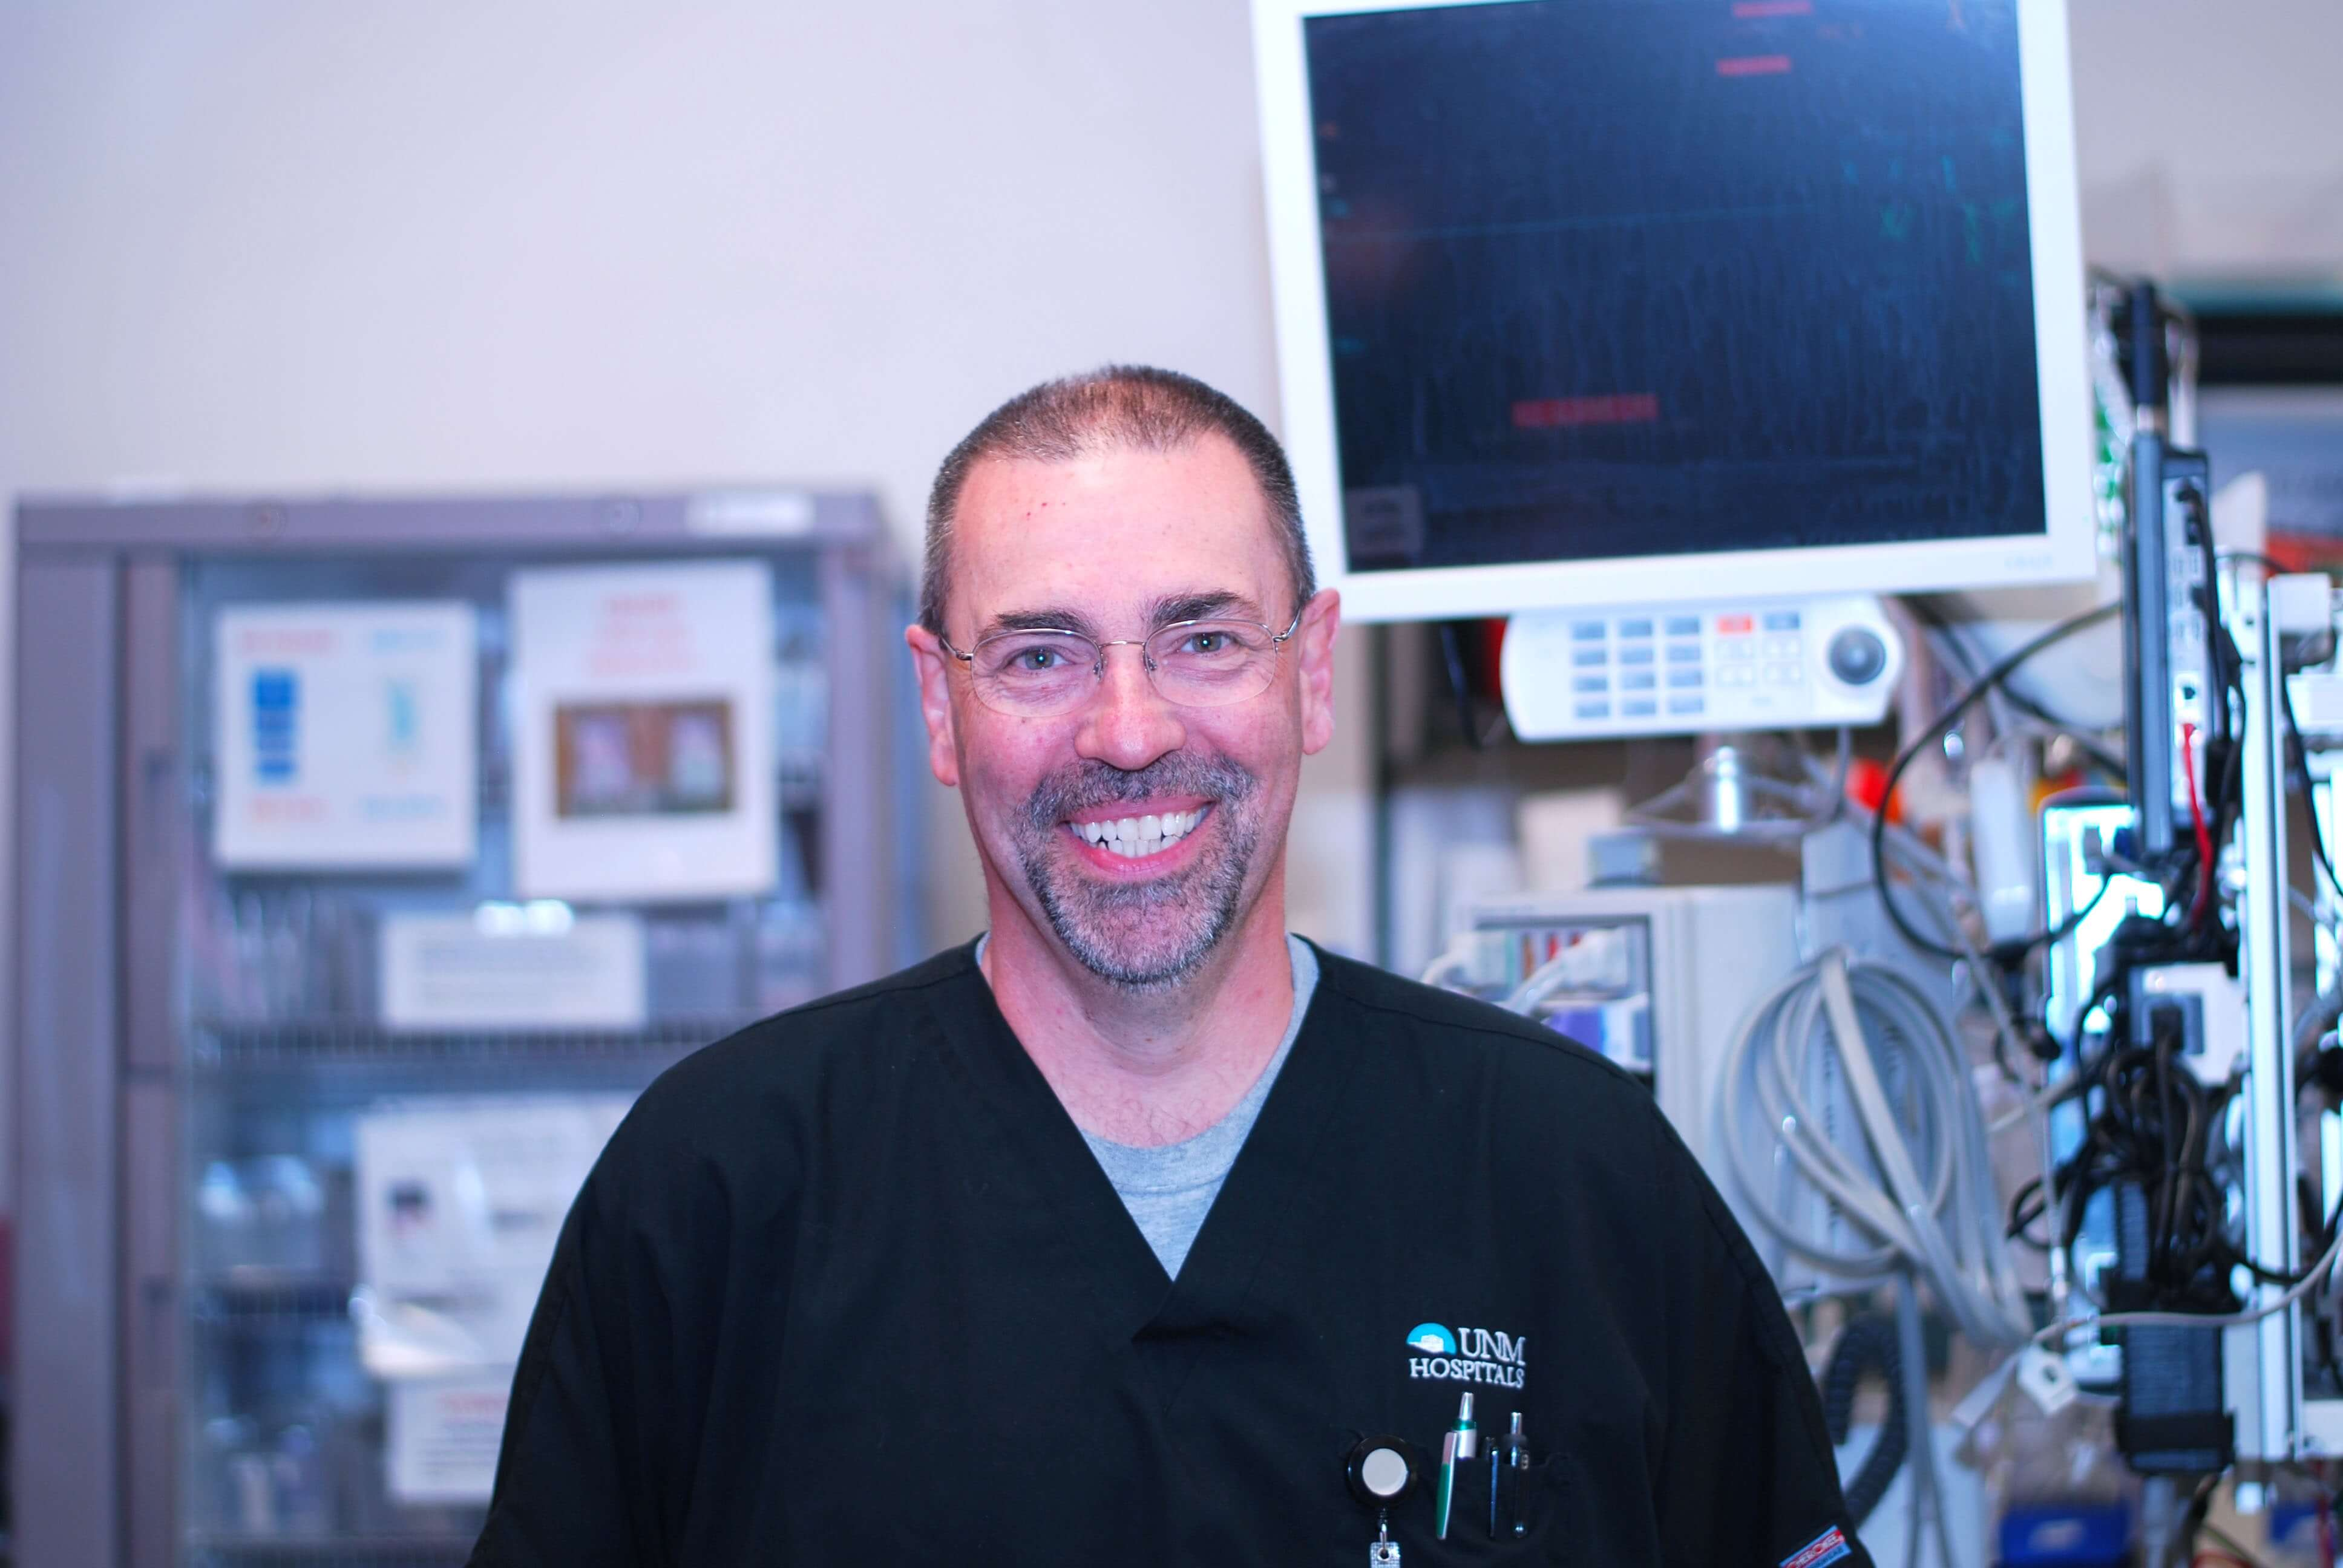 Employee Spotlight | Chris, RN Inpatient Supervisor